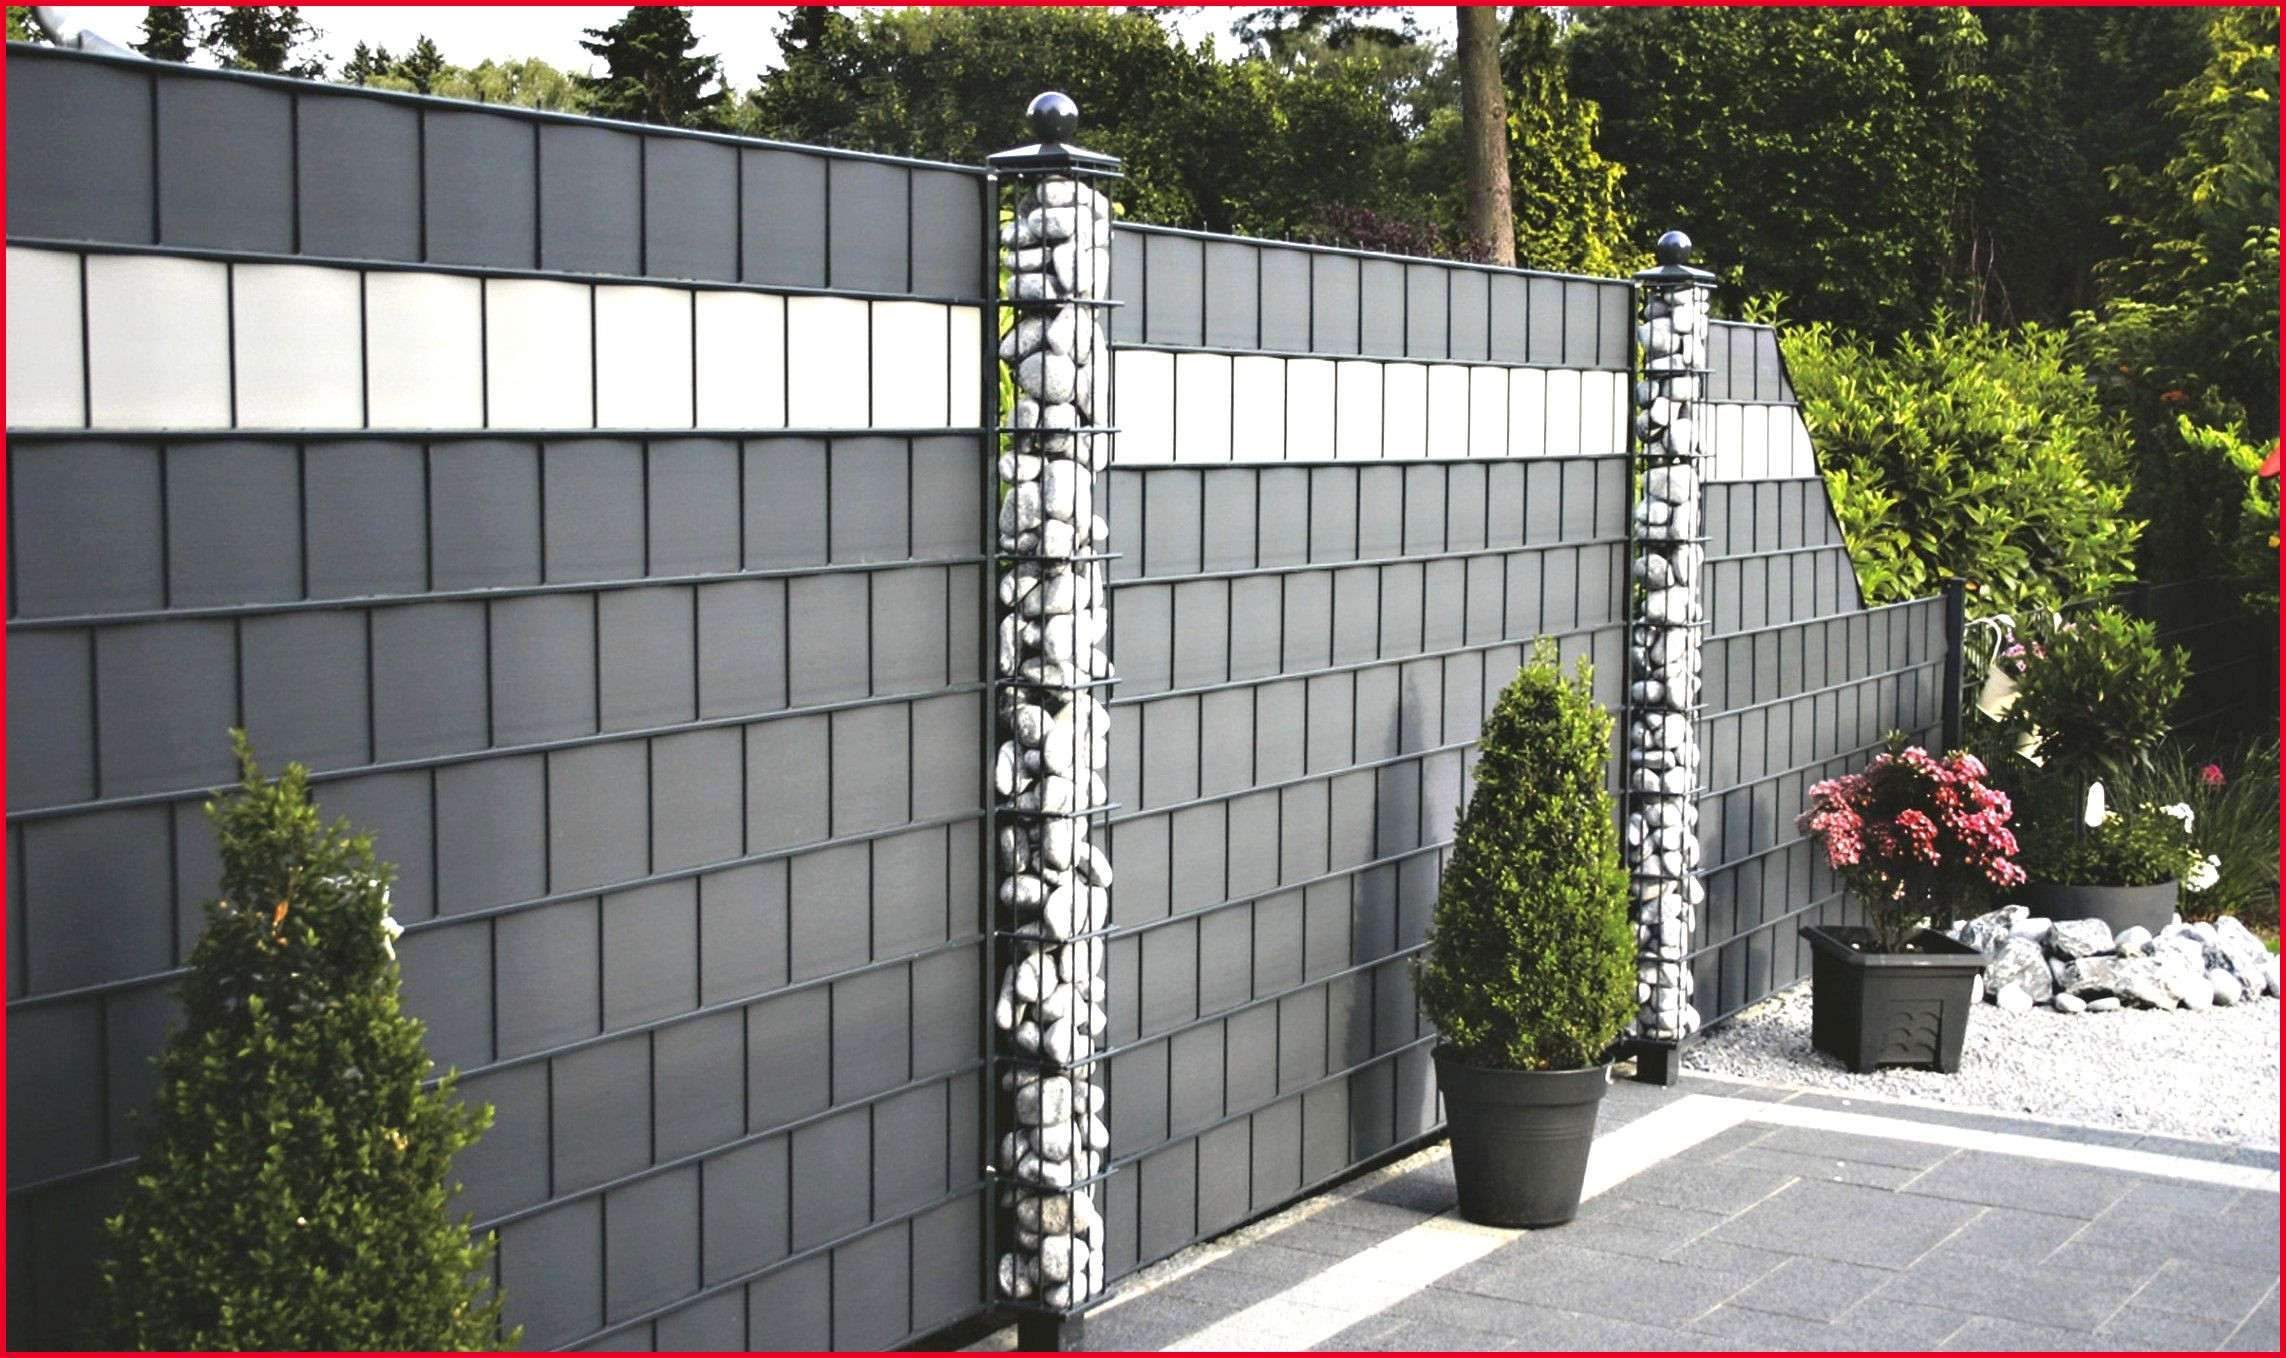 26 Genial Garten Modern Gestalten Einzigartig Garten Anlegen